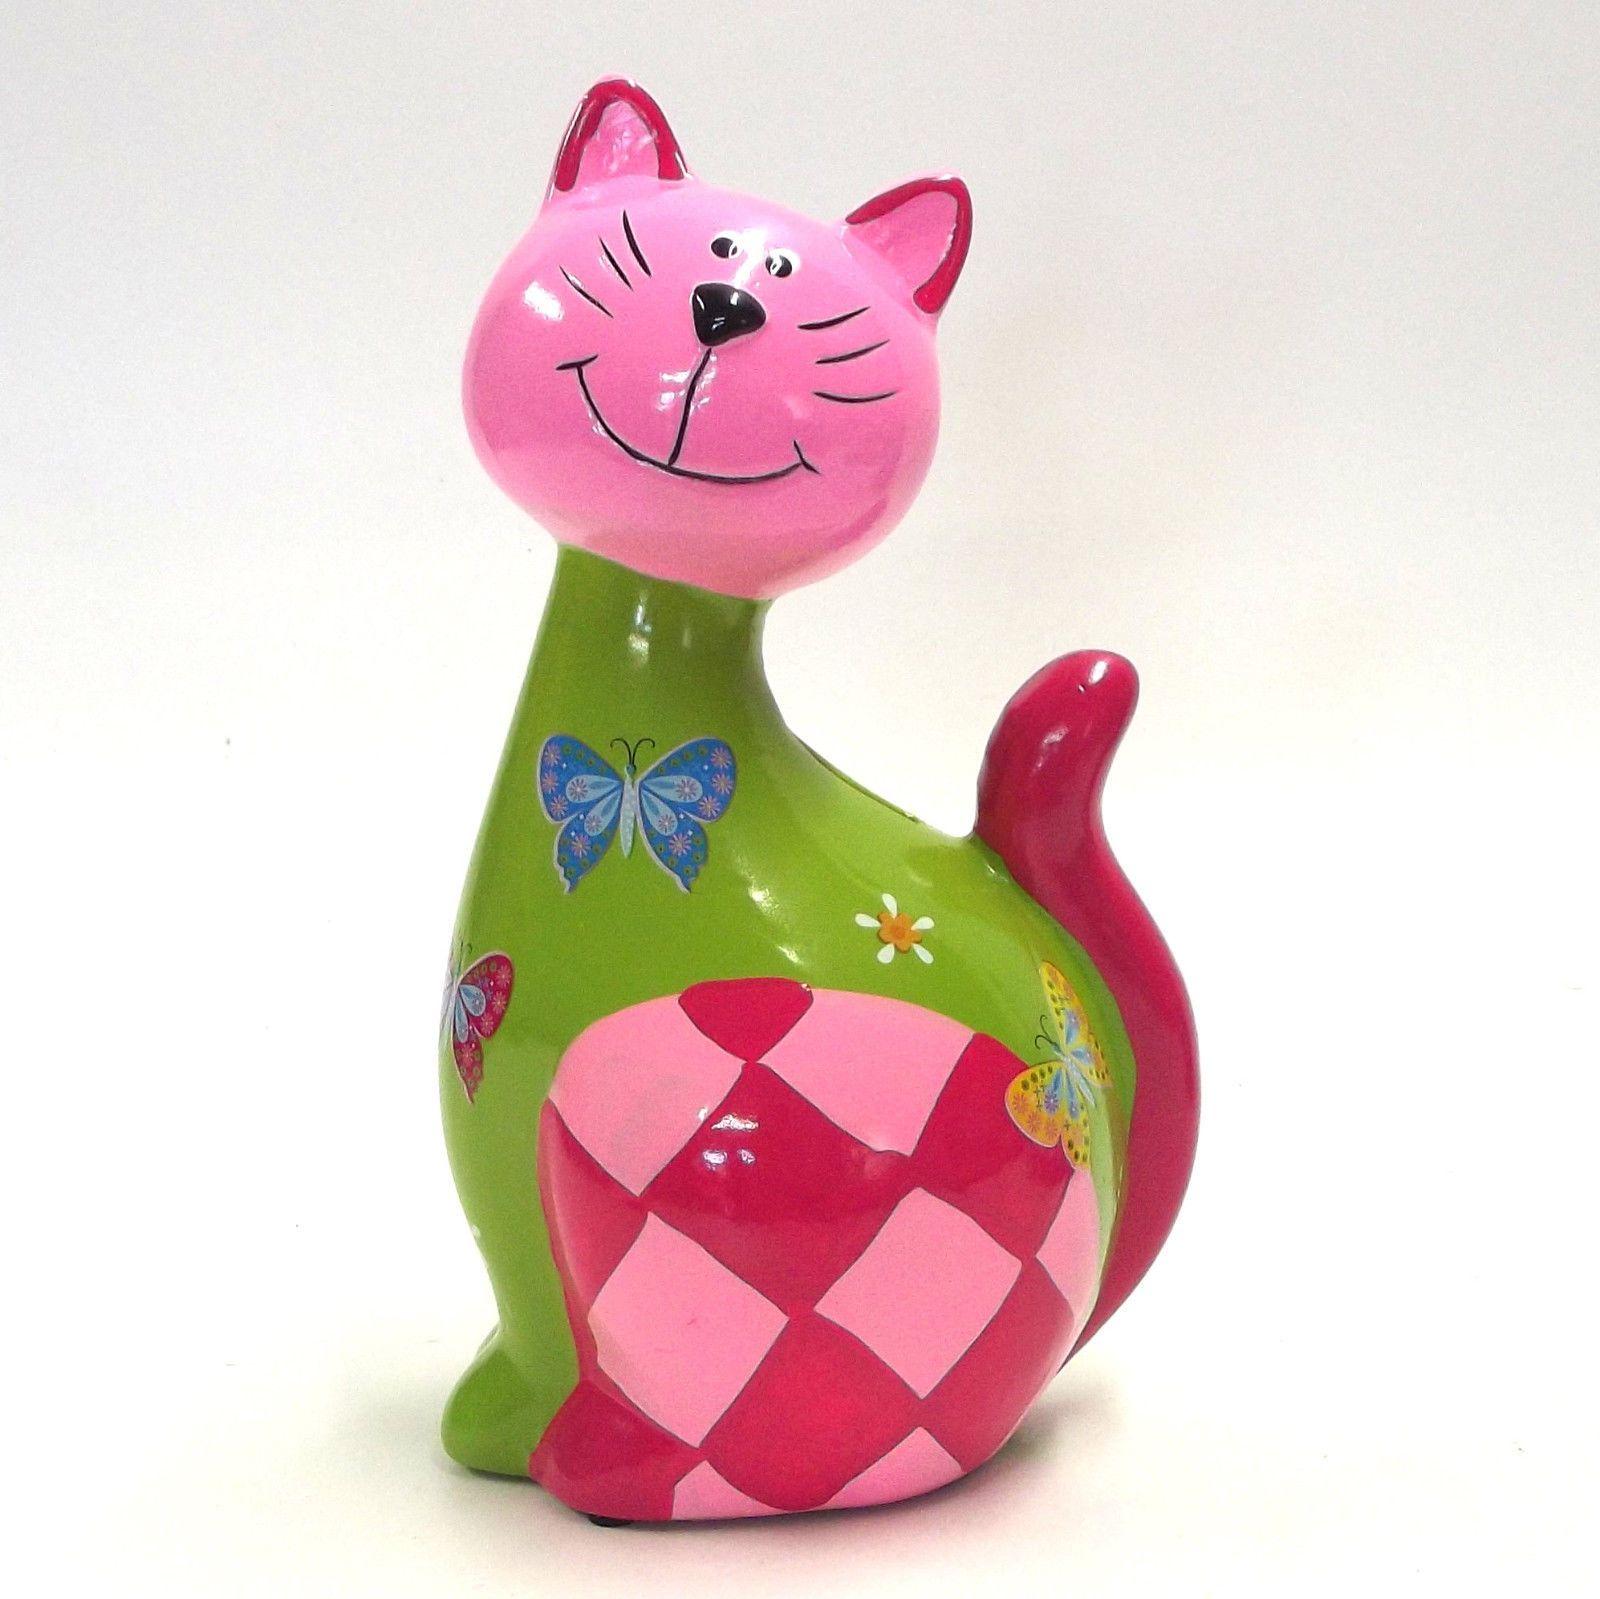 Cat Kitty Kitten Ornament Statue Money Box Pink Ceramic Garden Sculpture Art   eBay